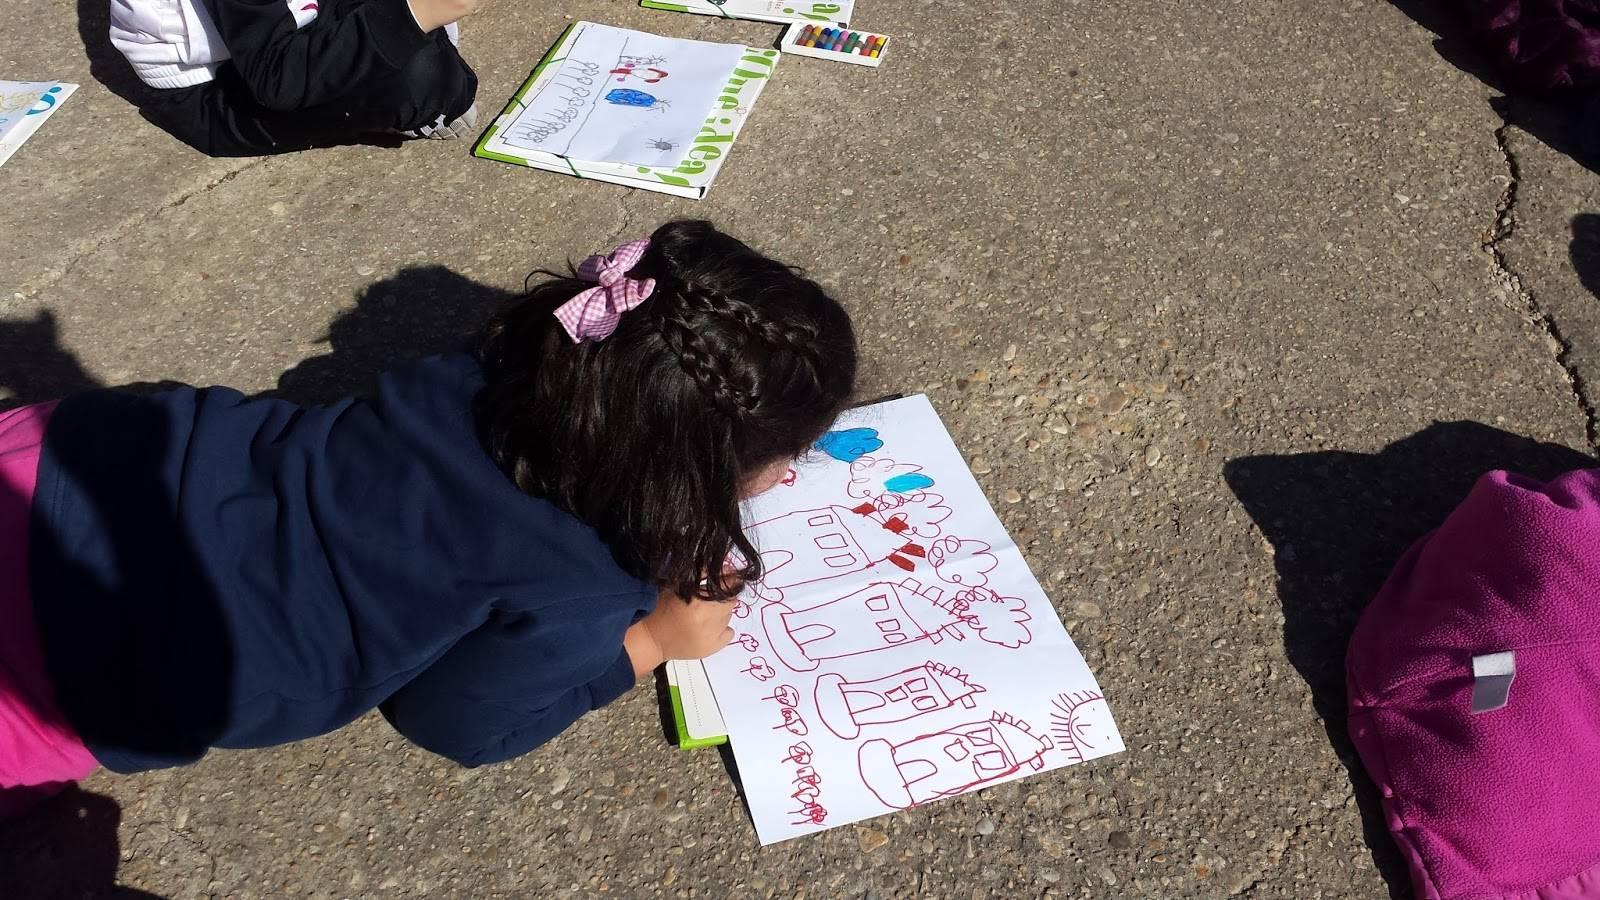 alumna del ceip carrasco alcalde de herencia dibujando - El cartel de Carnaval 2017 del CEIP Carrasco Alcalde